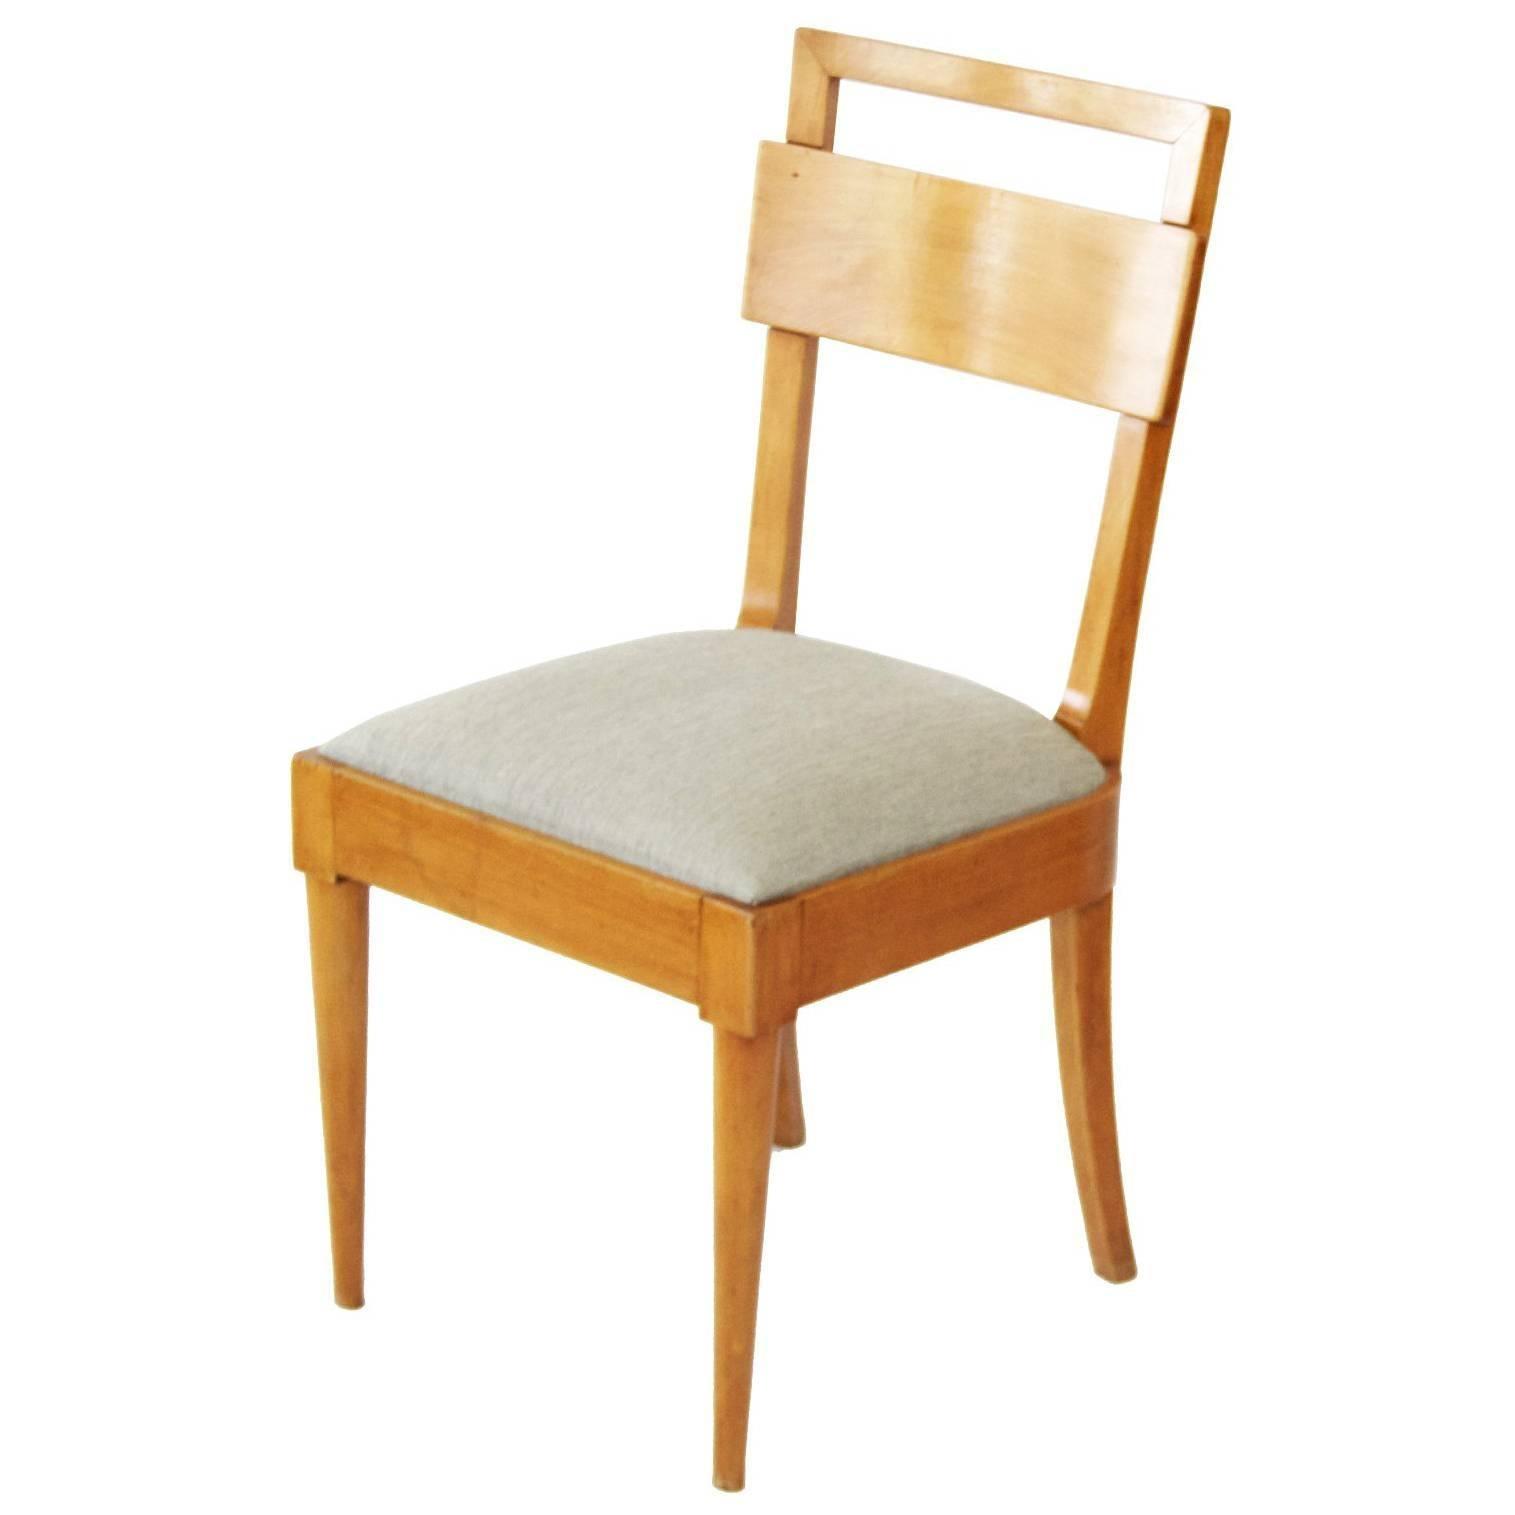 Teperman Midcentury brazilian chair in Ivory Wood, 1960s